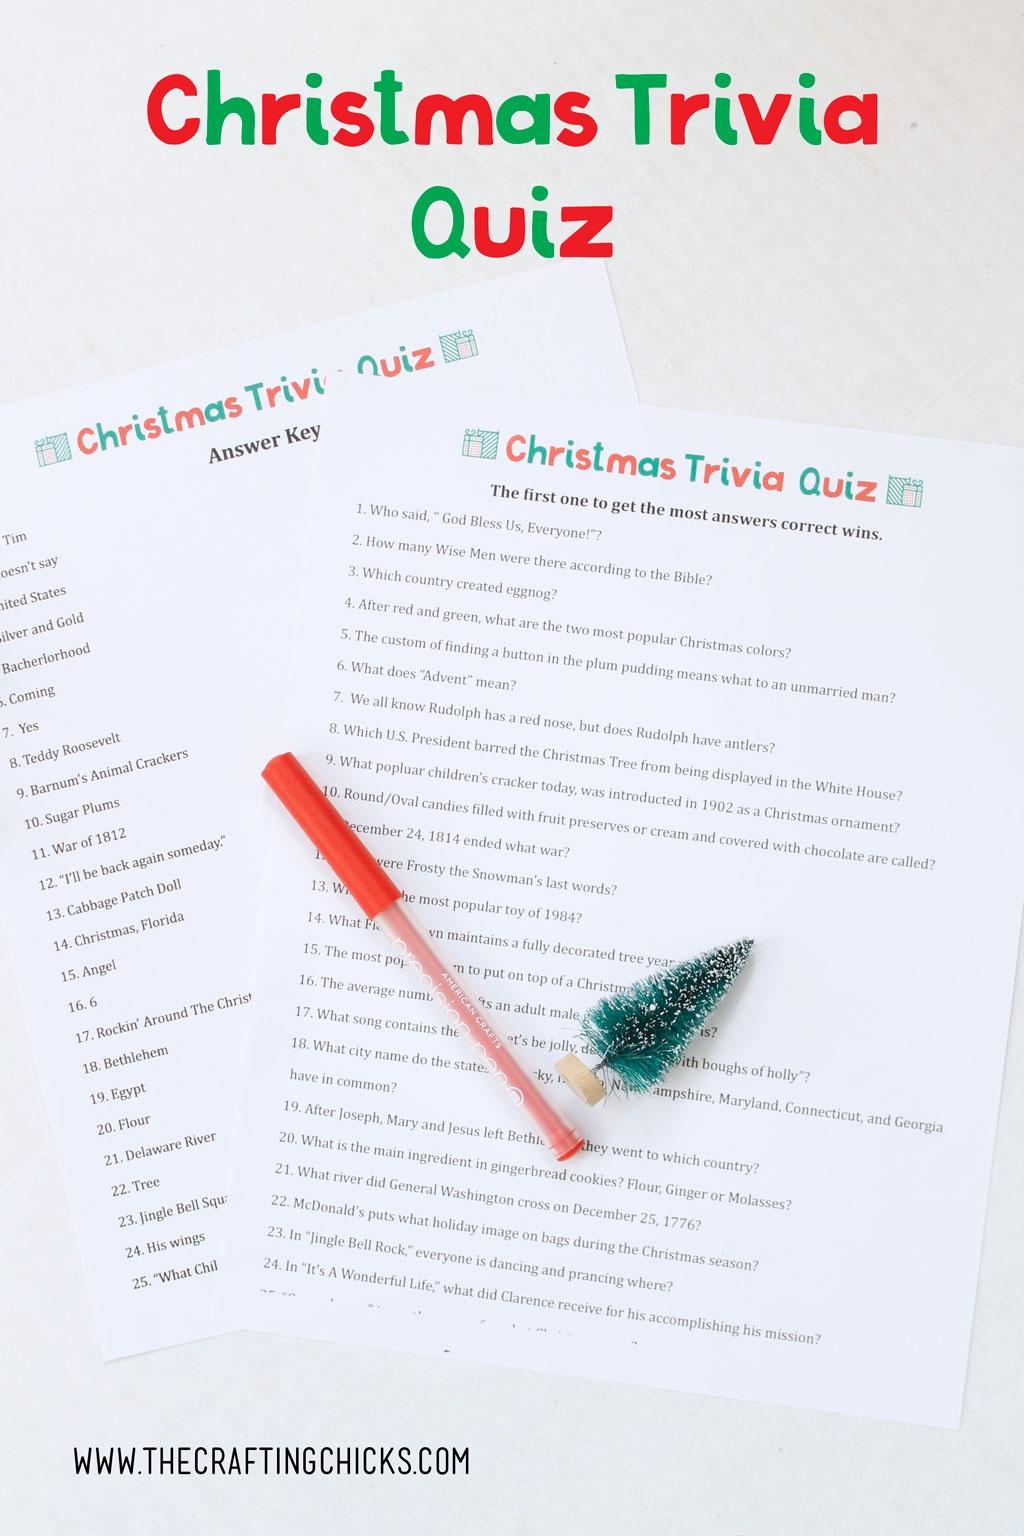 Christmas Trivia Quiz Free Printable - The Crafting Chicks - Free Printable Christmas Trivia Quiz